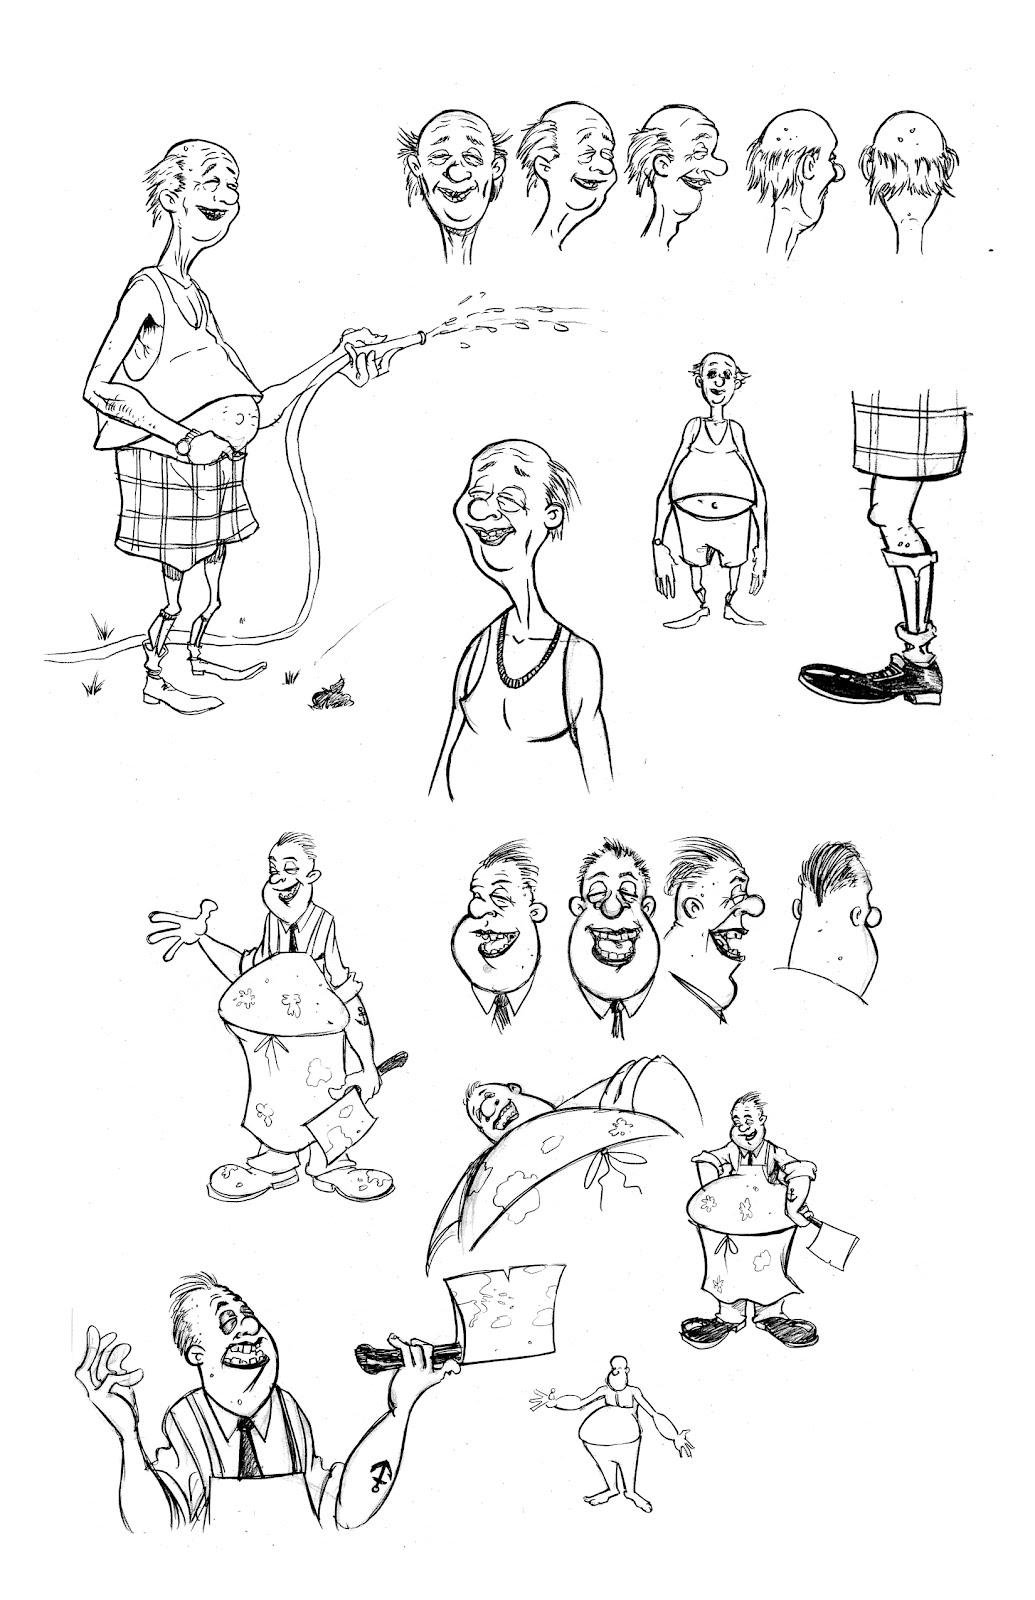 Character Design Concept Sketches : Cartoon concept design frank forte sketchbook now on sale